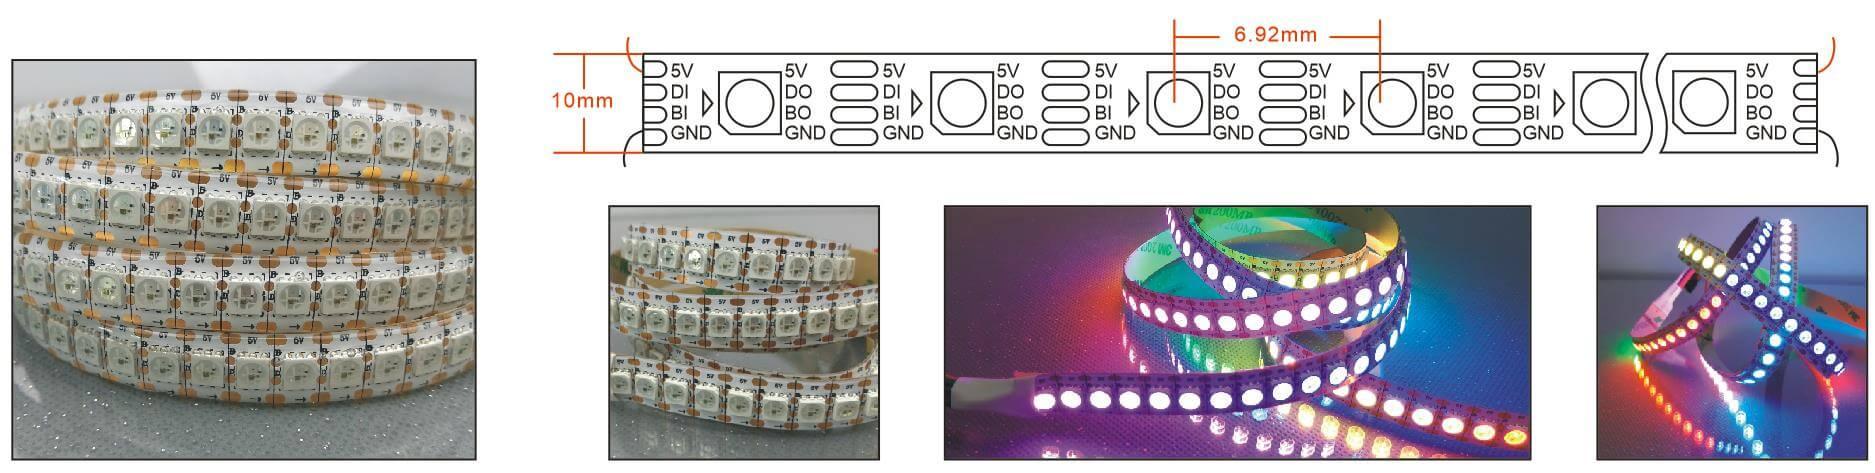 ws2813 addressable strip 144 LED per meter